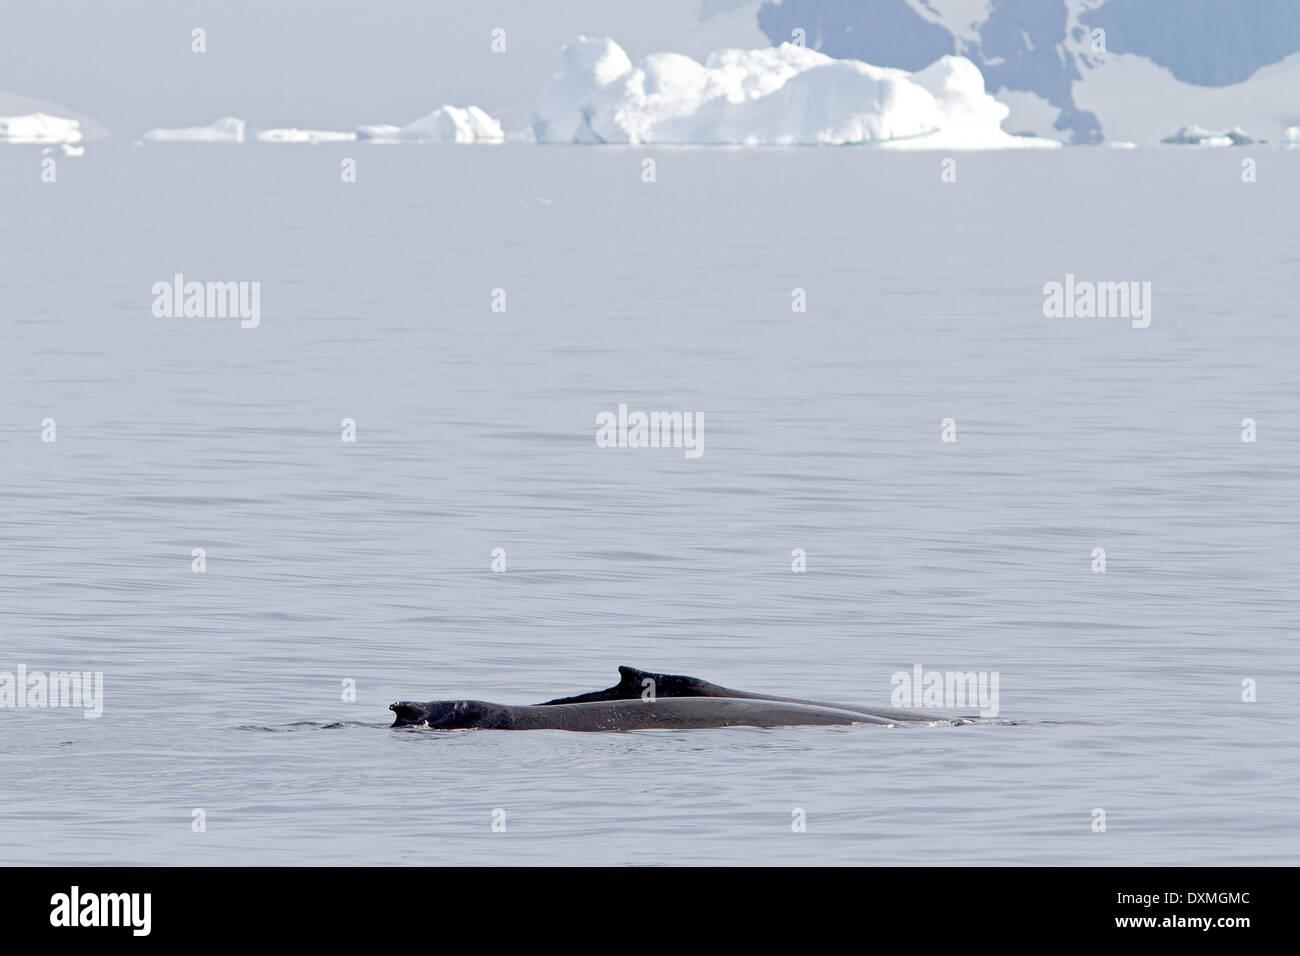 La Antártida BALLENAS JOROBADAS MEGAPTERA NOVAEANGLIAE Antártico. La ballena de aleta dorsal. Foto de stock